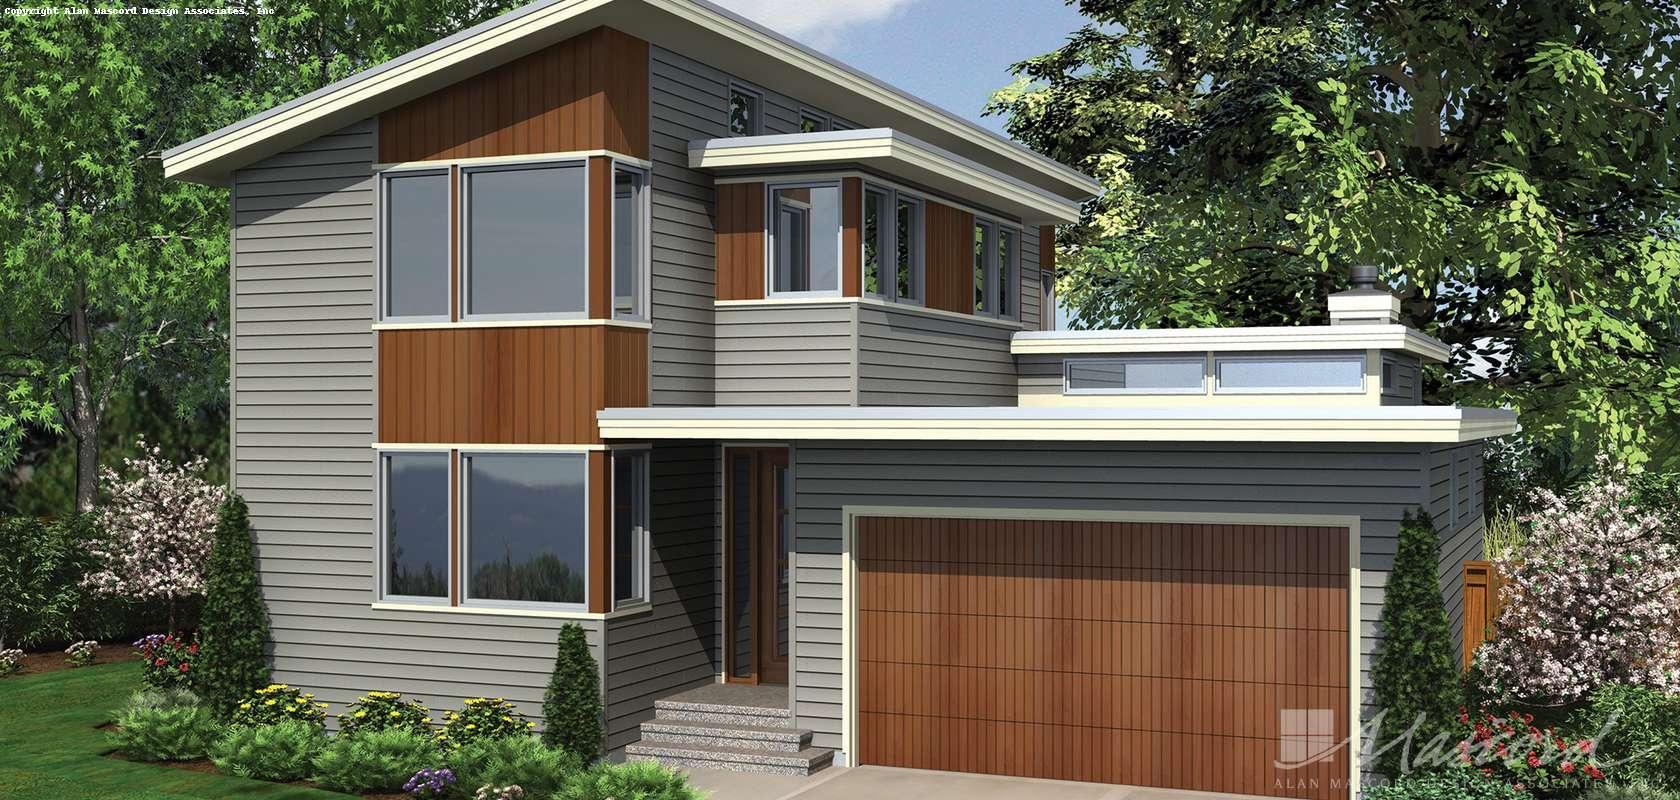 Mascord House Plan 22179: The Dain